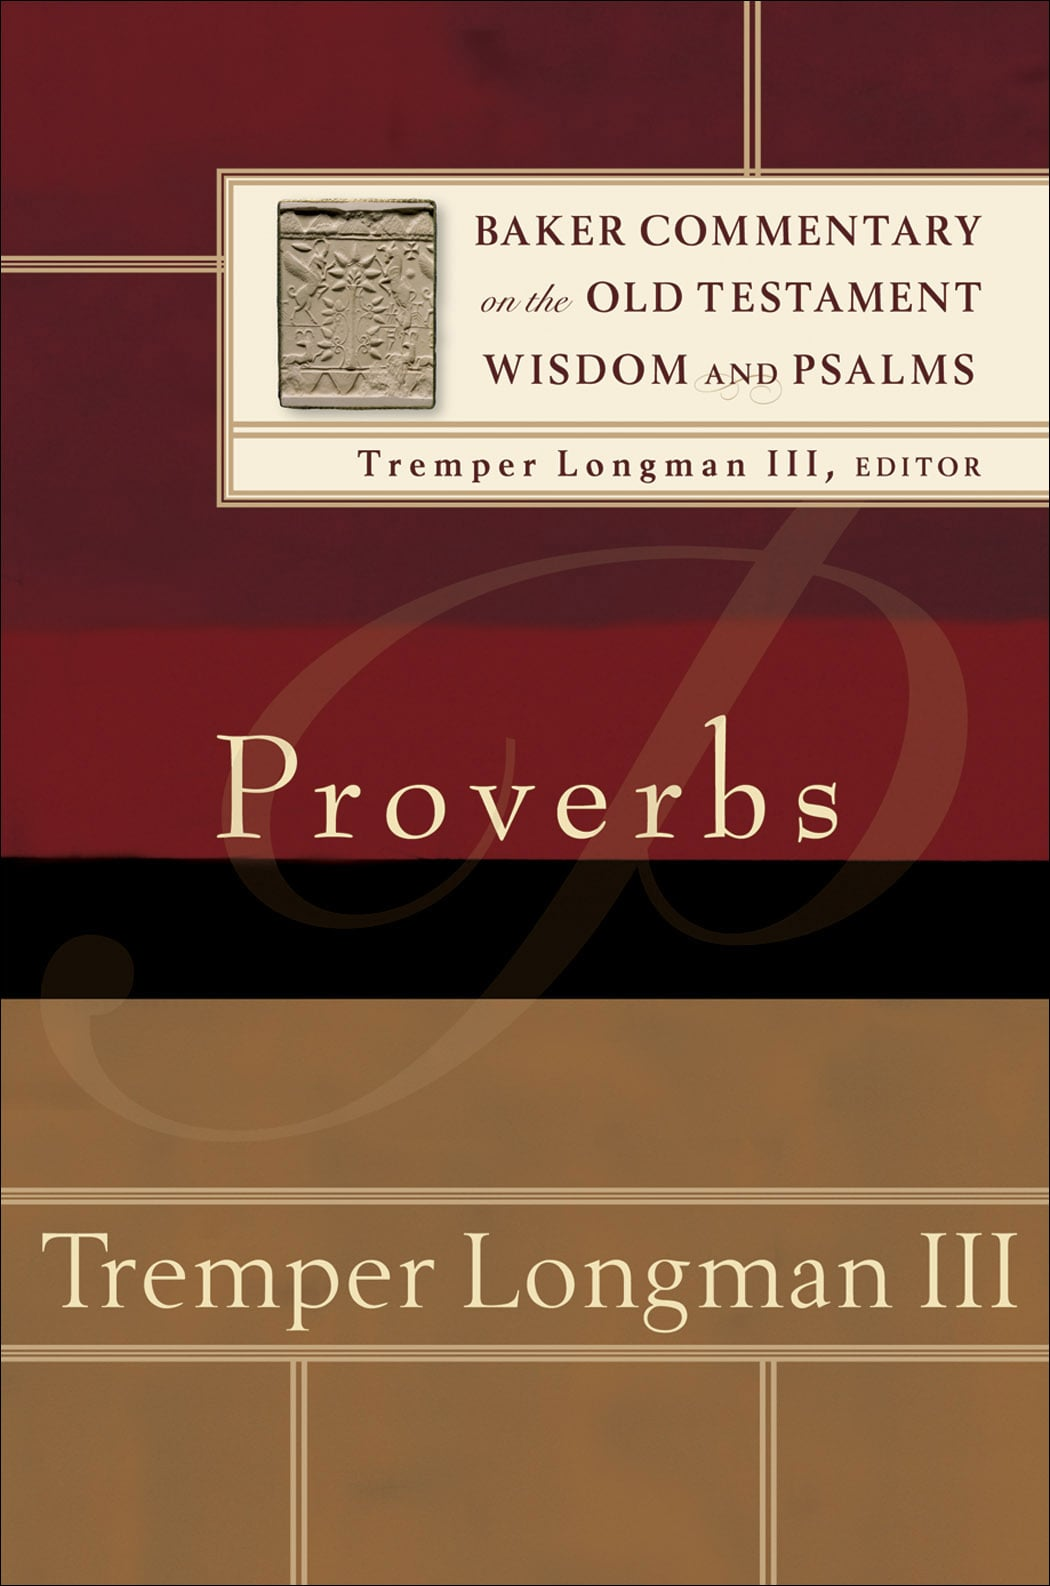 Longman_Proverbs.jpg